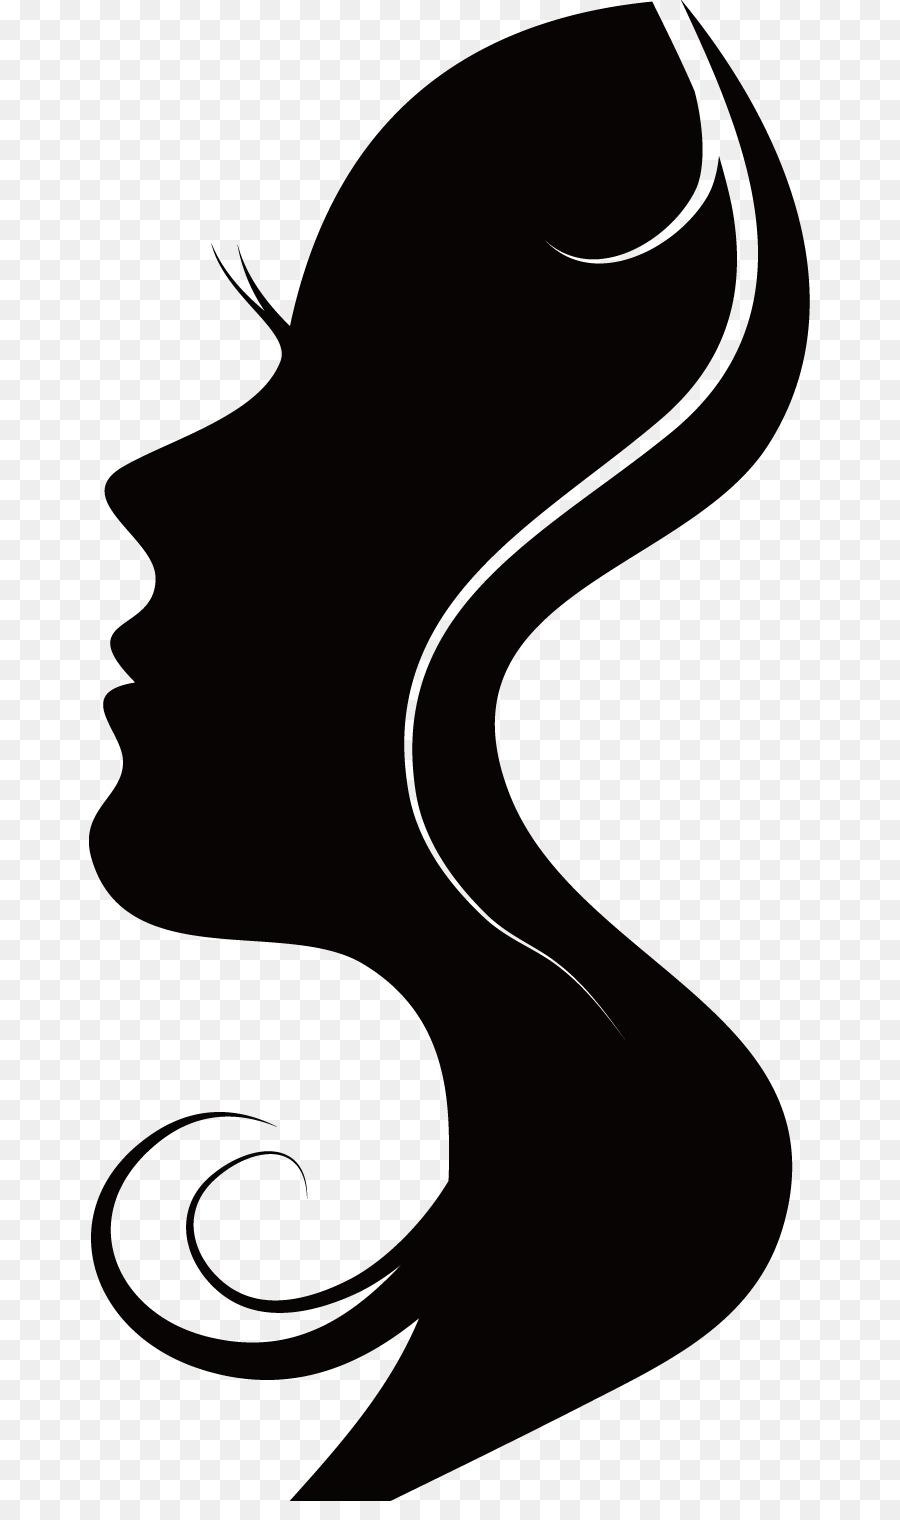 Free Woman Silhouette Logo, Download Free Clip Art, Free.